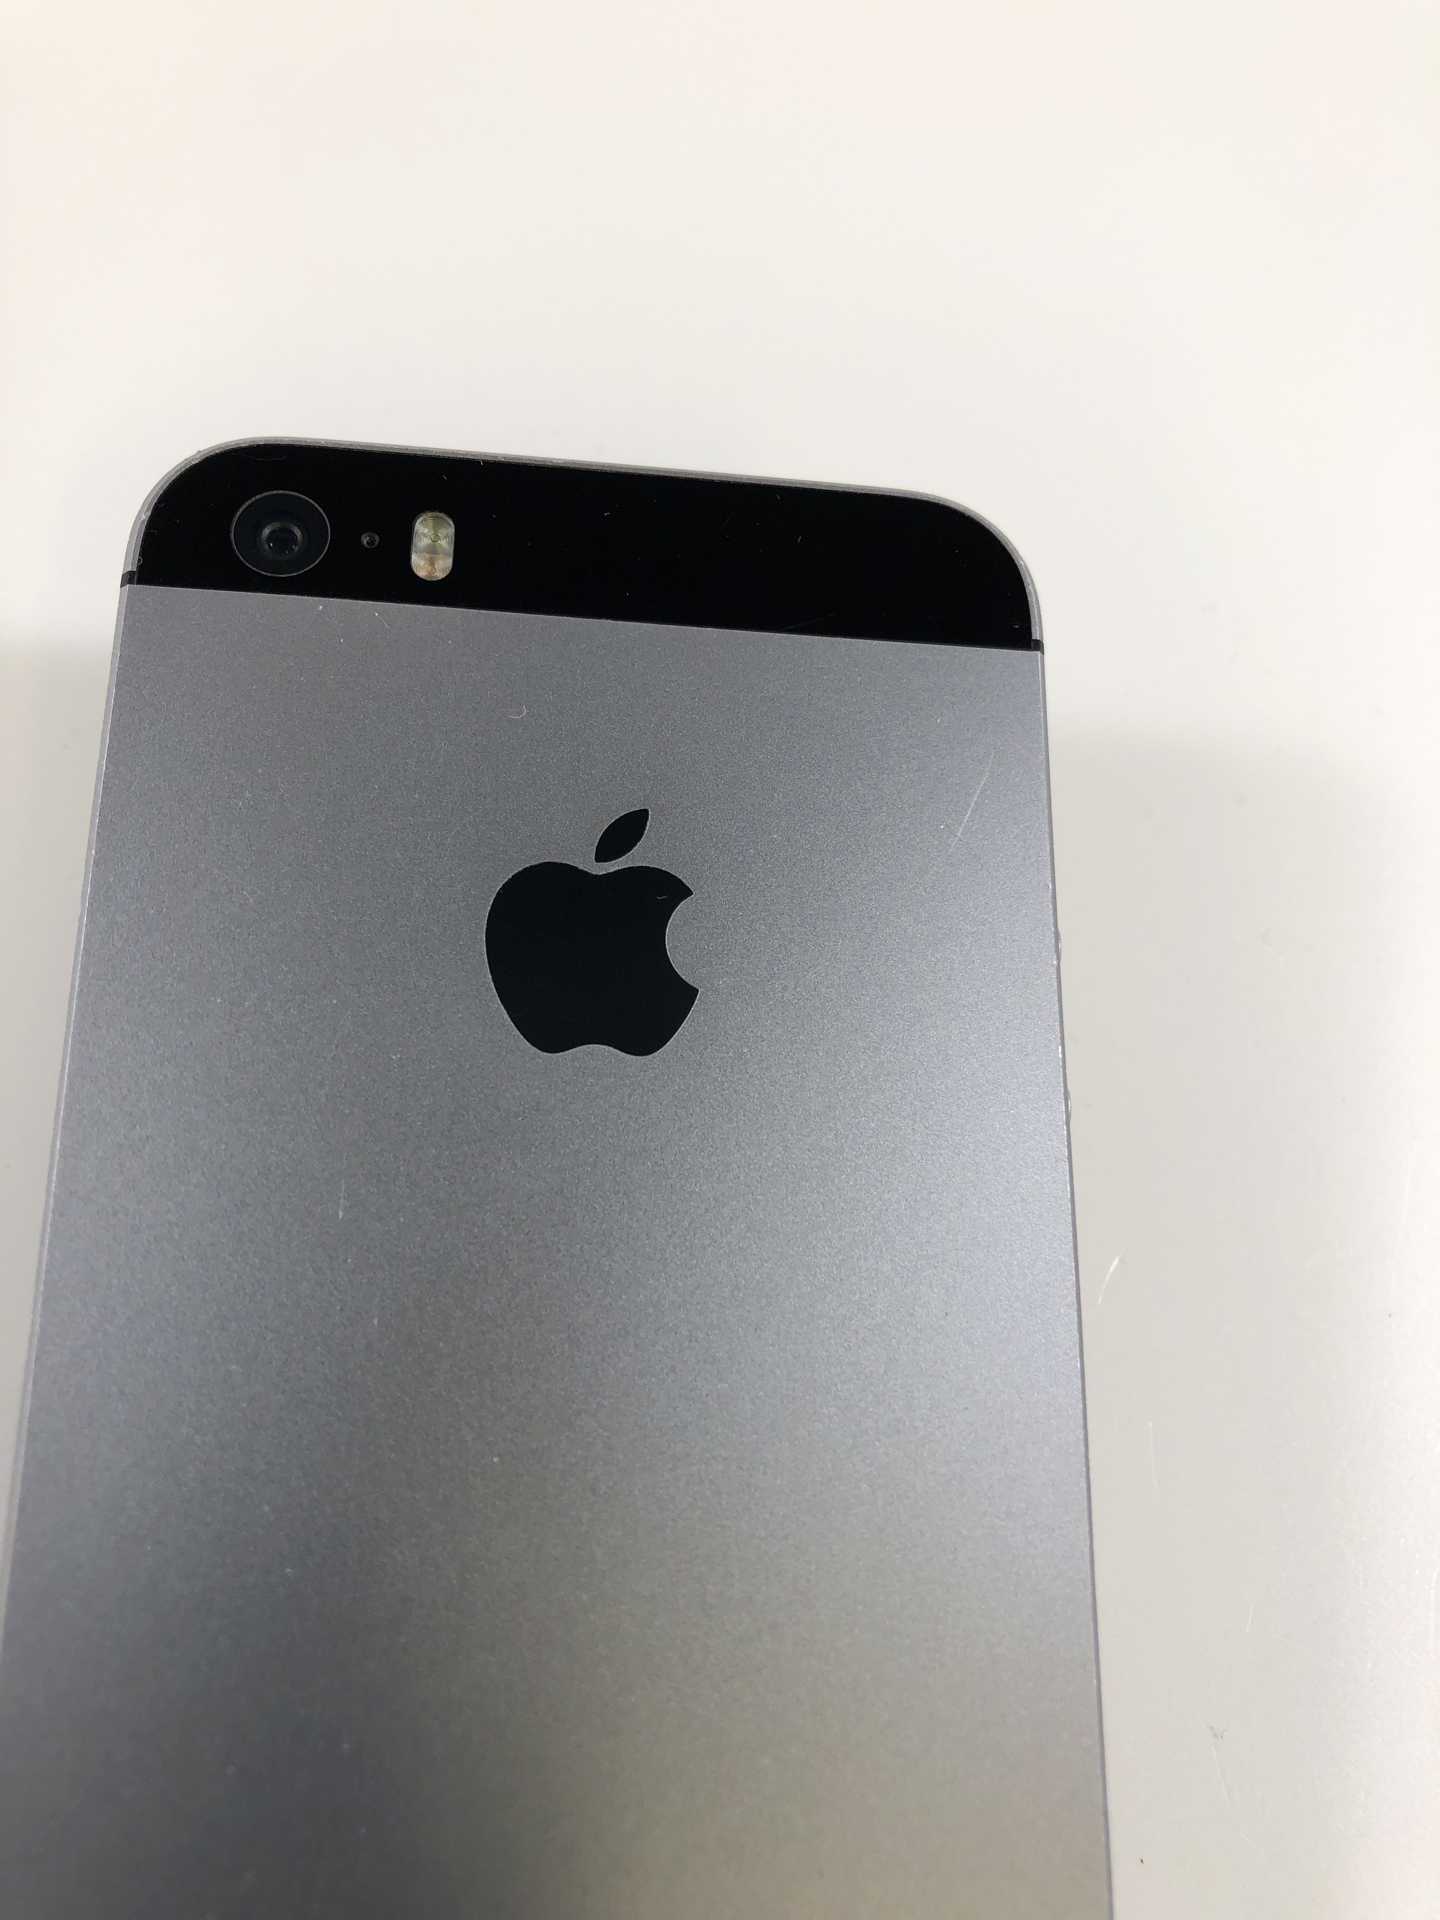 iPhone SE 16GB, 16GB, Space Gray, bild 3